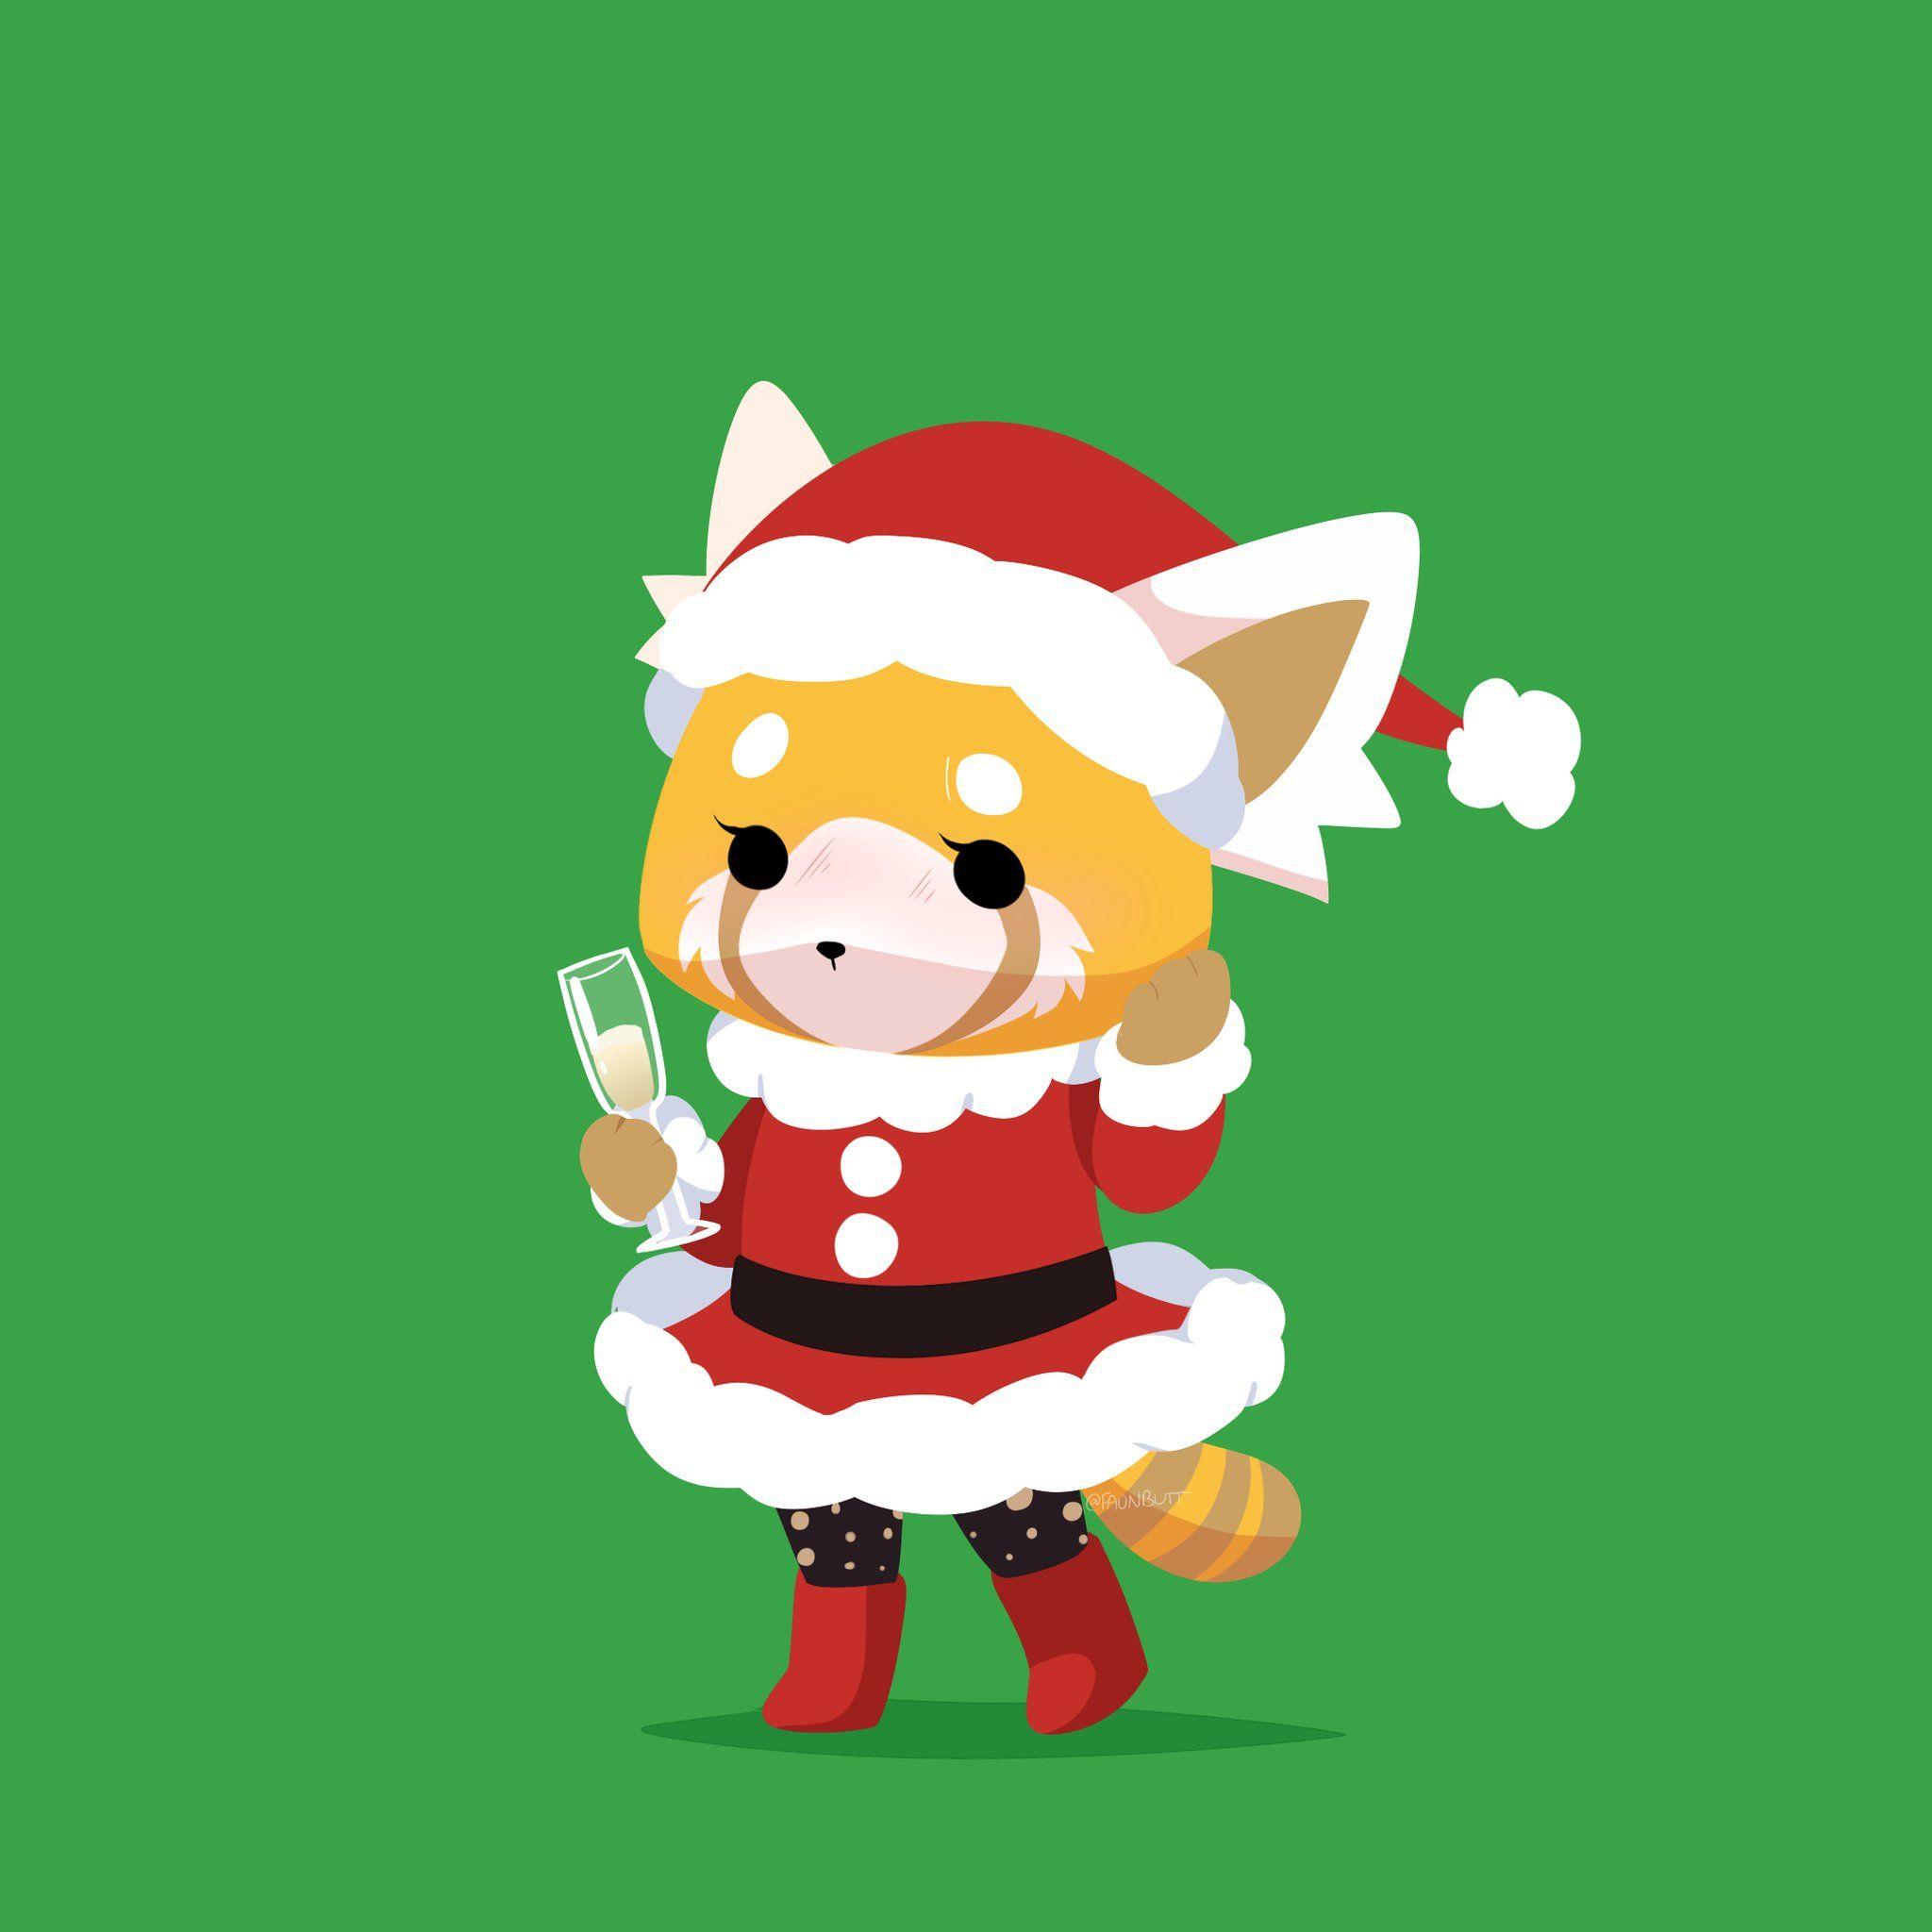 Aggretsuko Christmas.Esquizofrenia Natural On Holiday Greetings Popular Anime